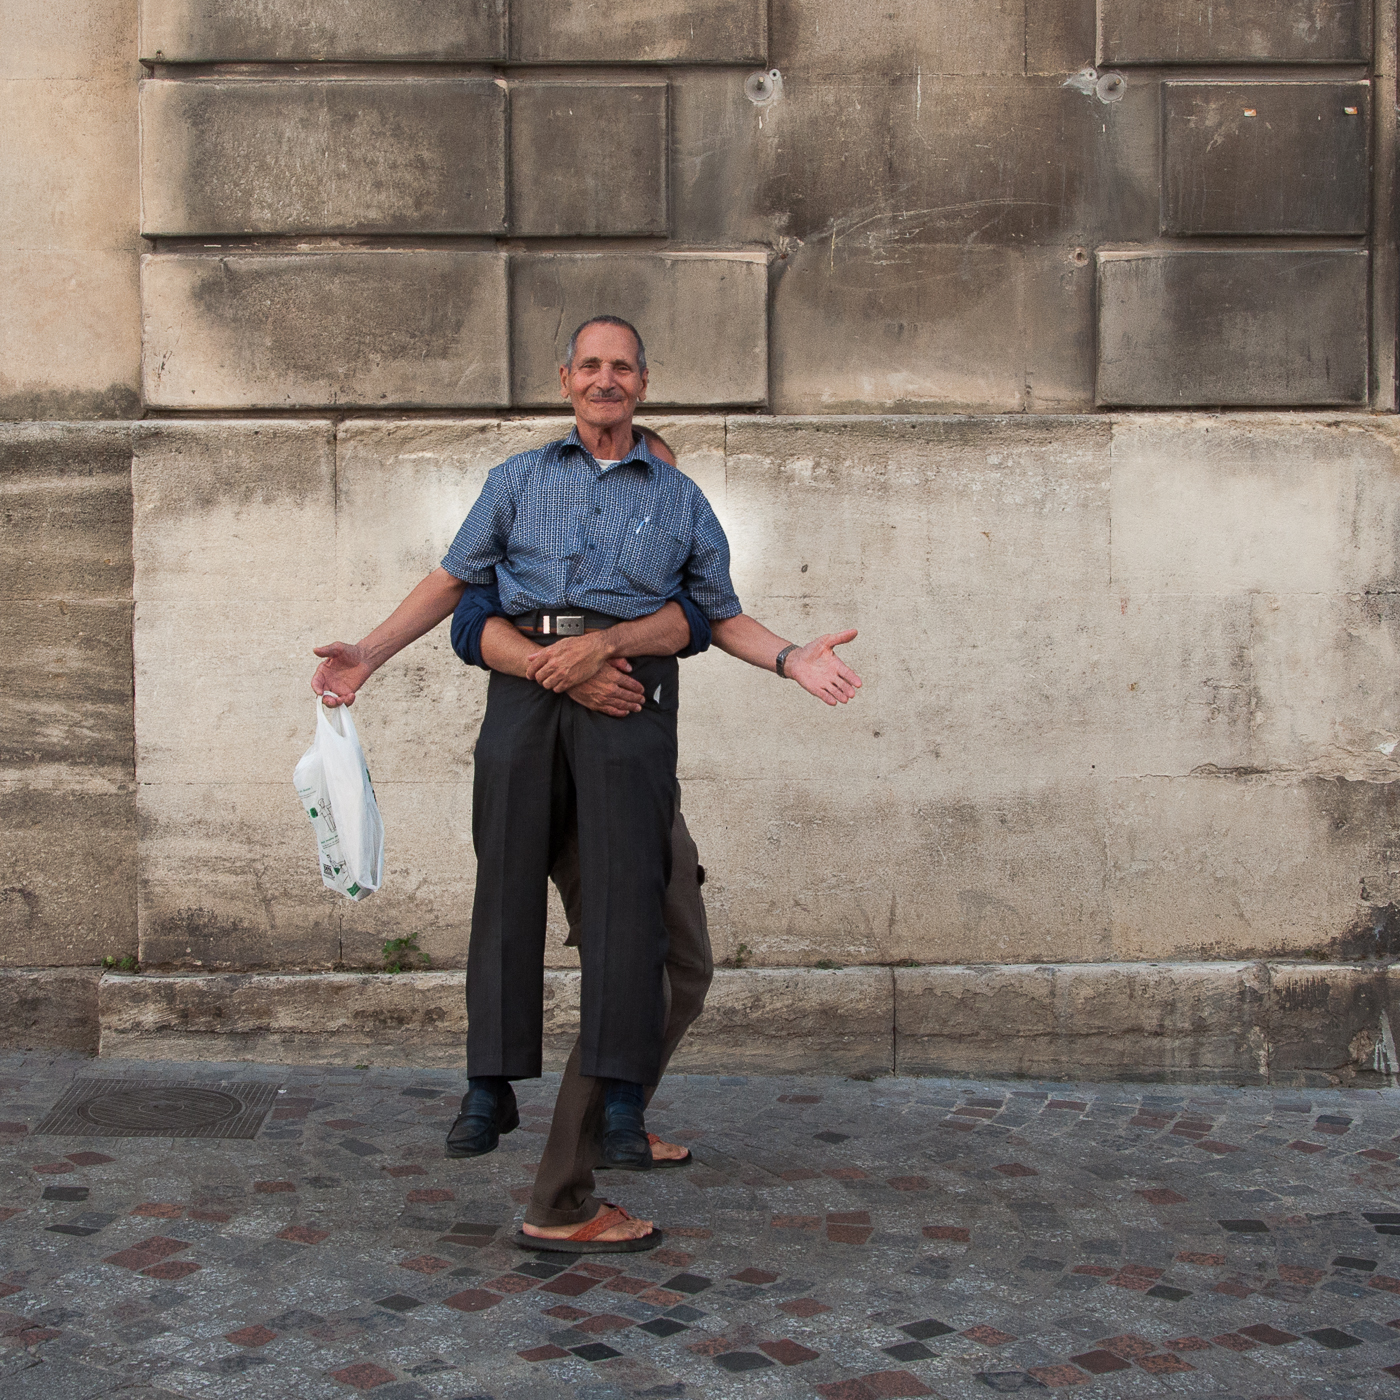 Arles 2015 - Simplement avec 4 bras